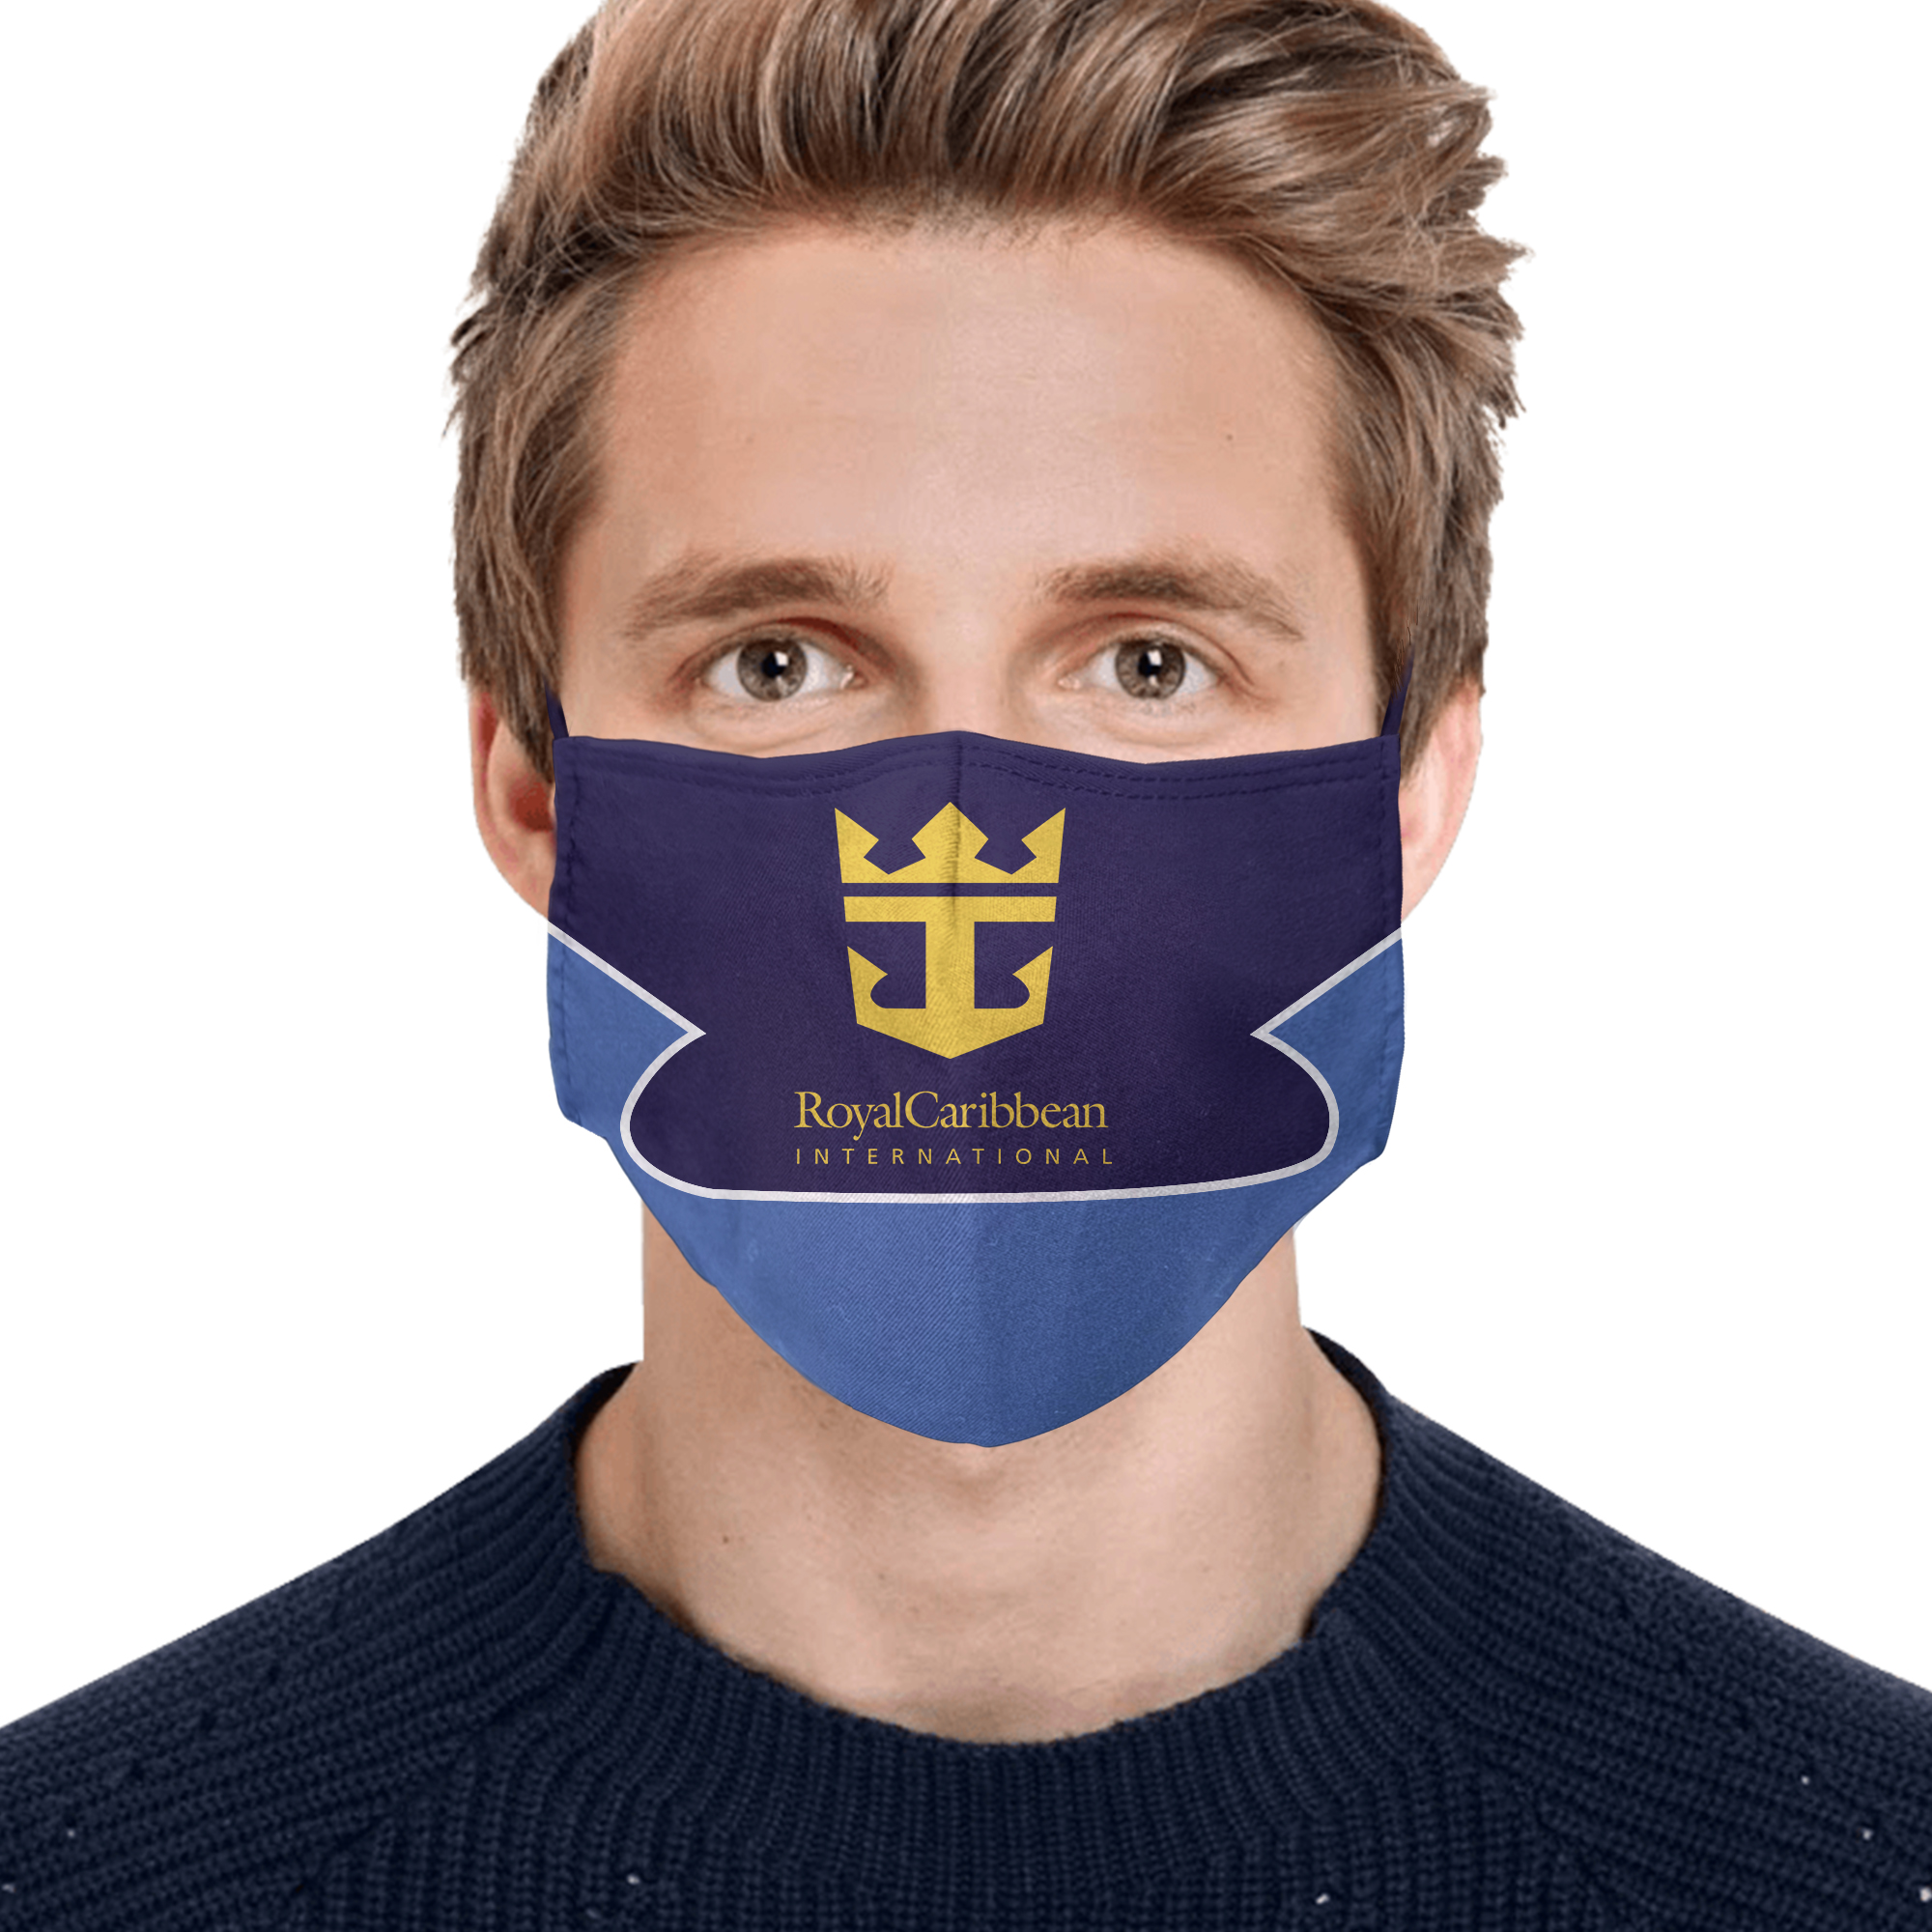 Royal caribbean international full printing face mask 2